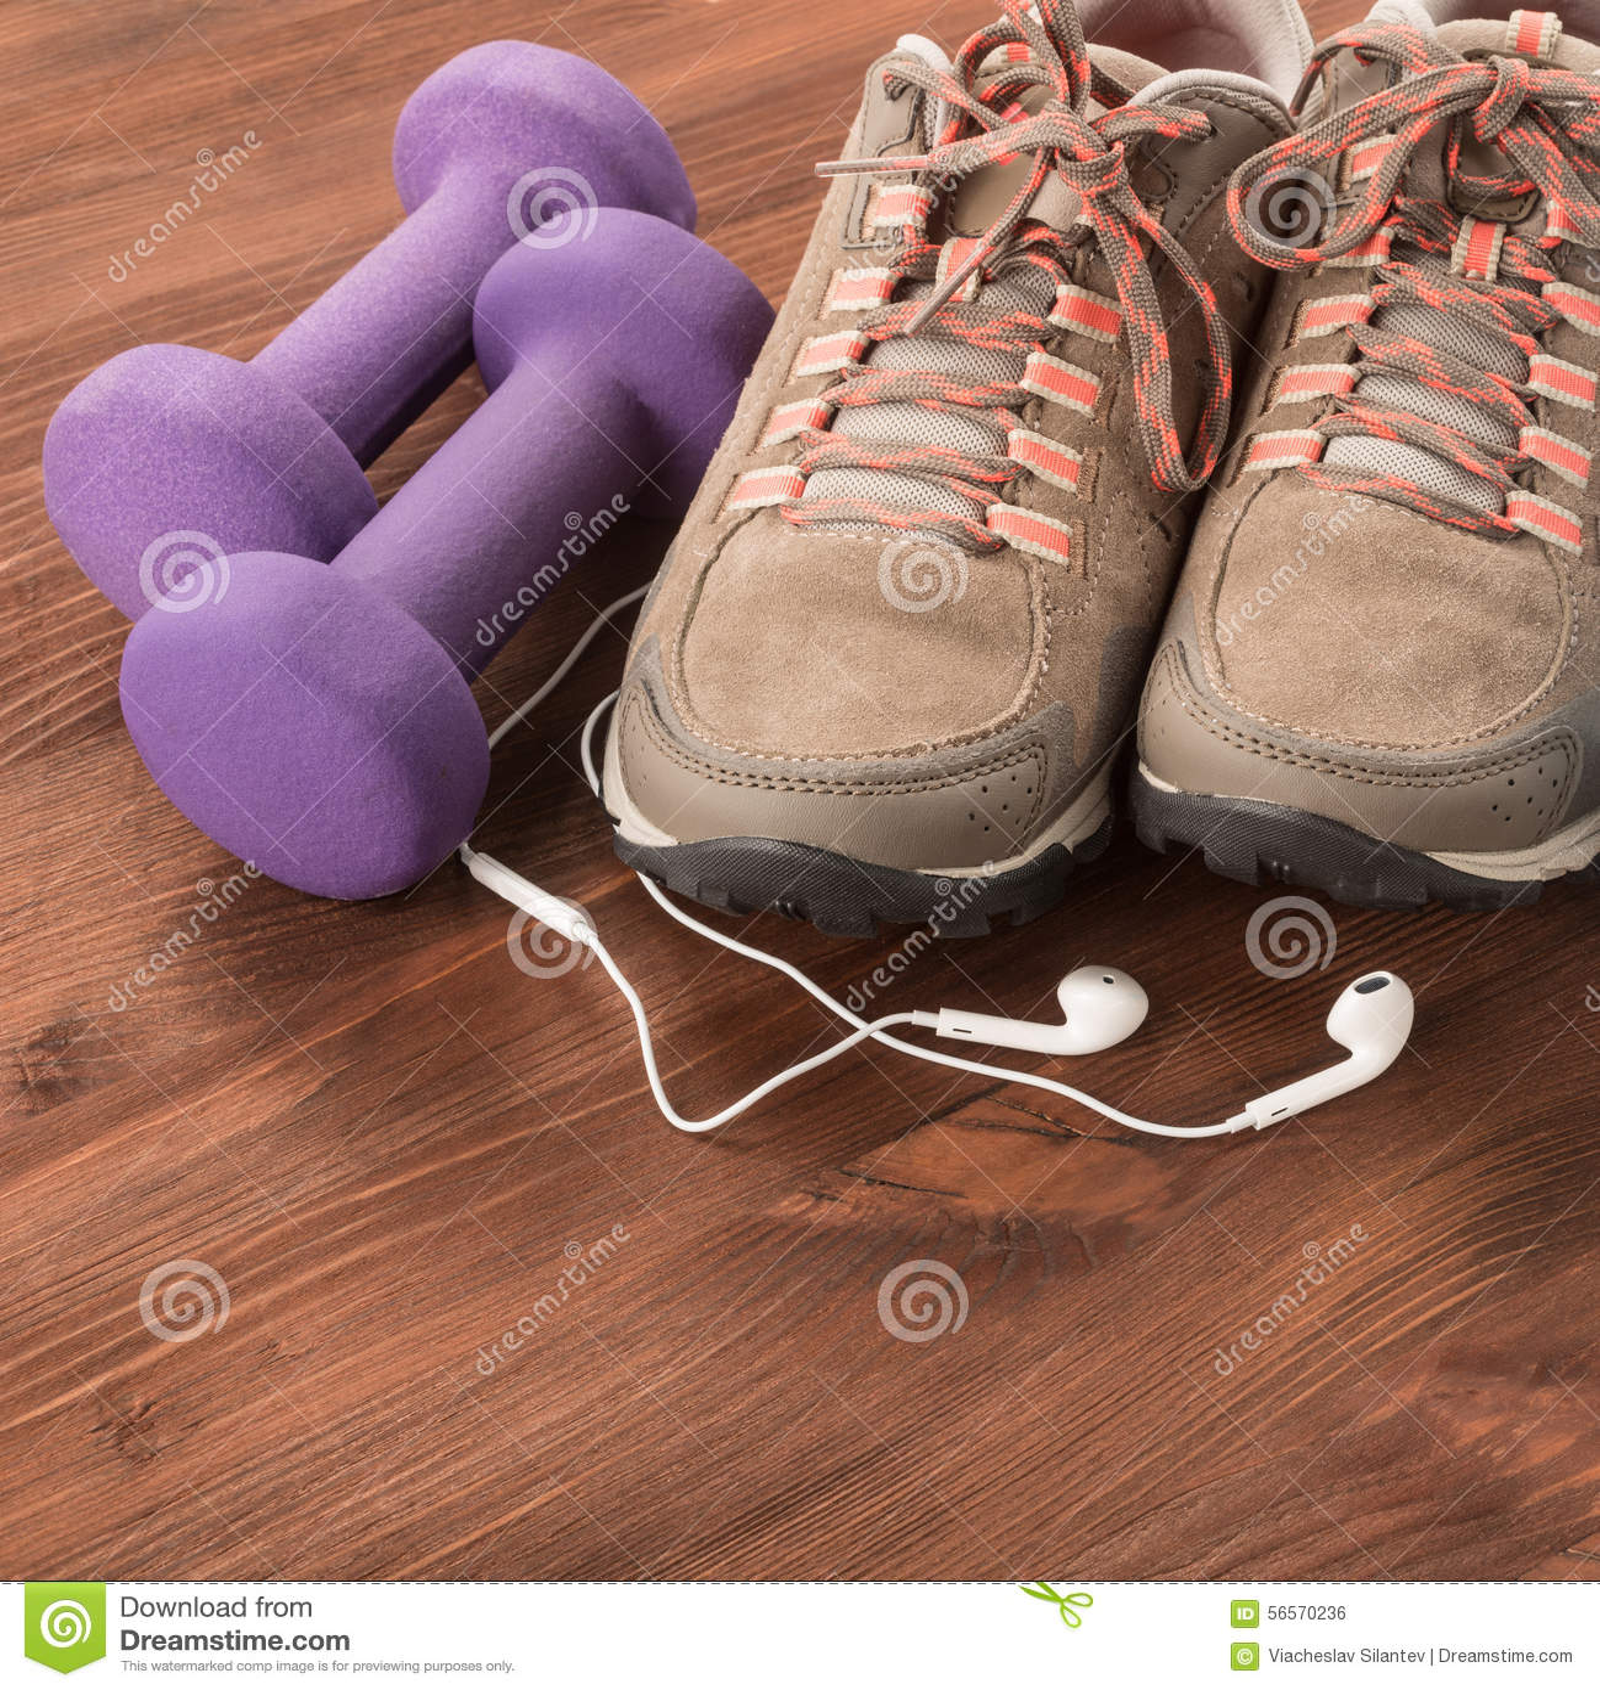 Download χαλάρωση ικανότητας έννοιας σφαιρών Pilates Στοκ Εικόνες - εικόνα από αερόμπικ, backfill: 56570236